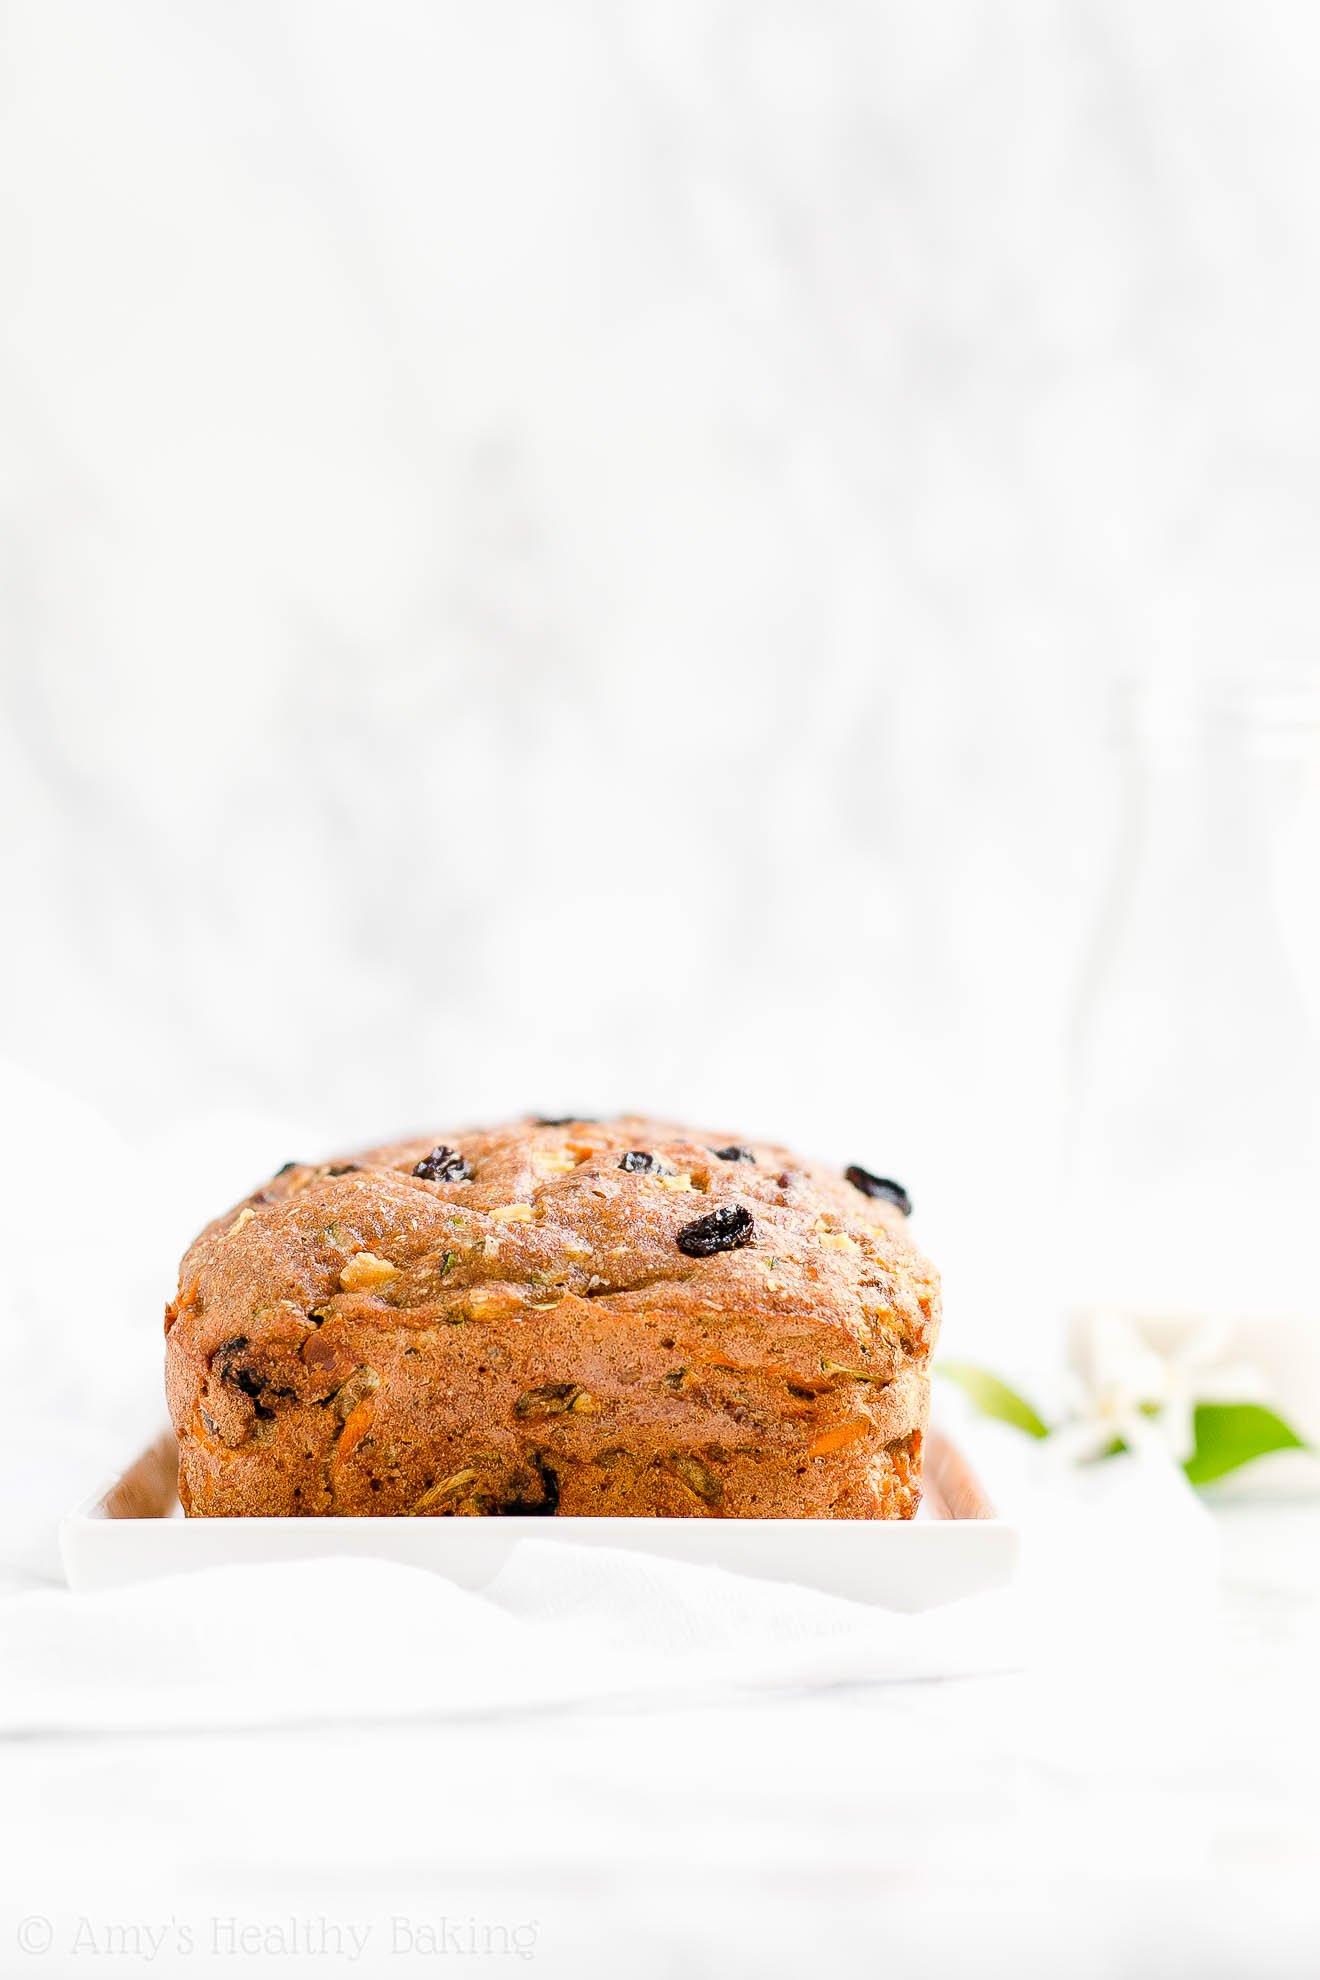 Healthy No Sugar Morning Glory Zucchini Bread